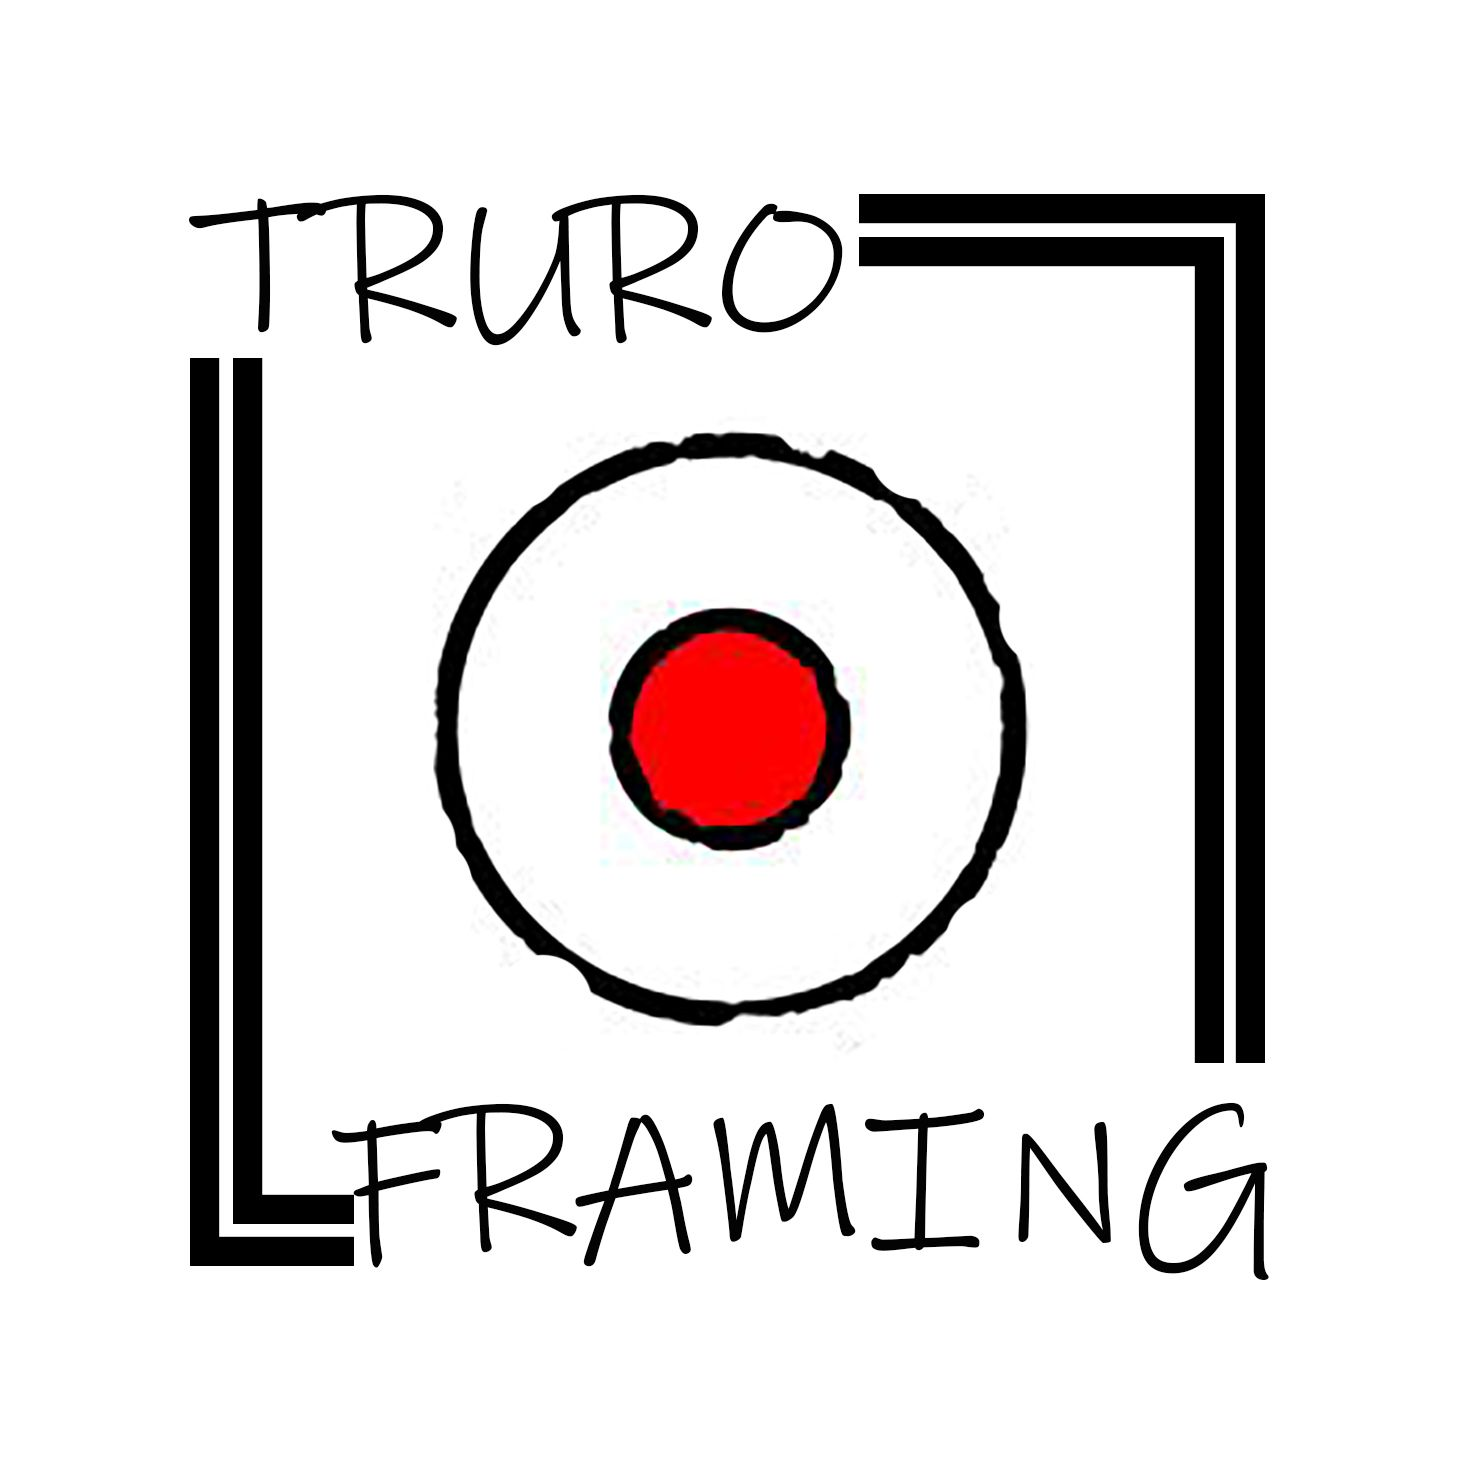 Truro Framing logo